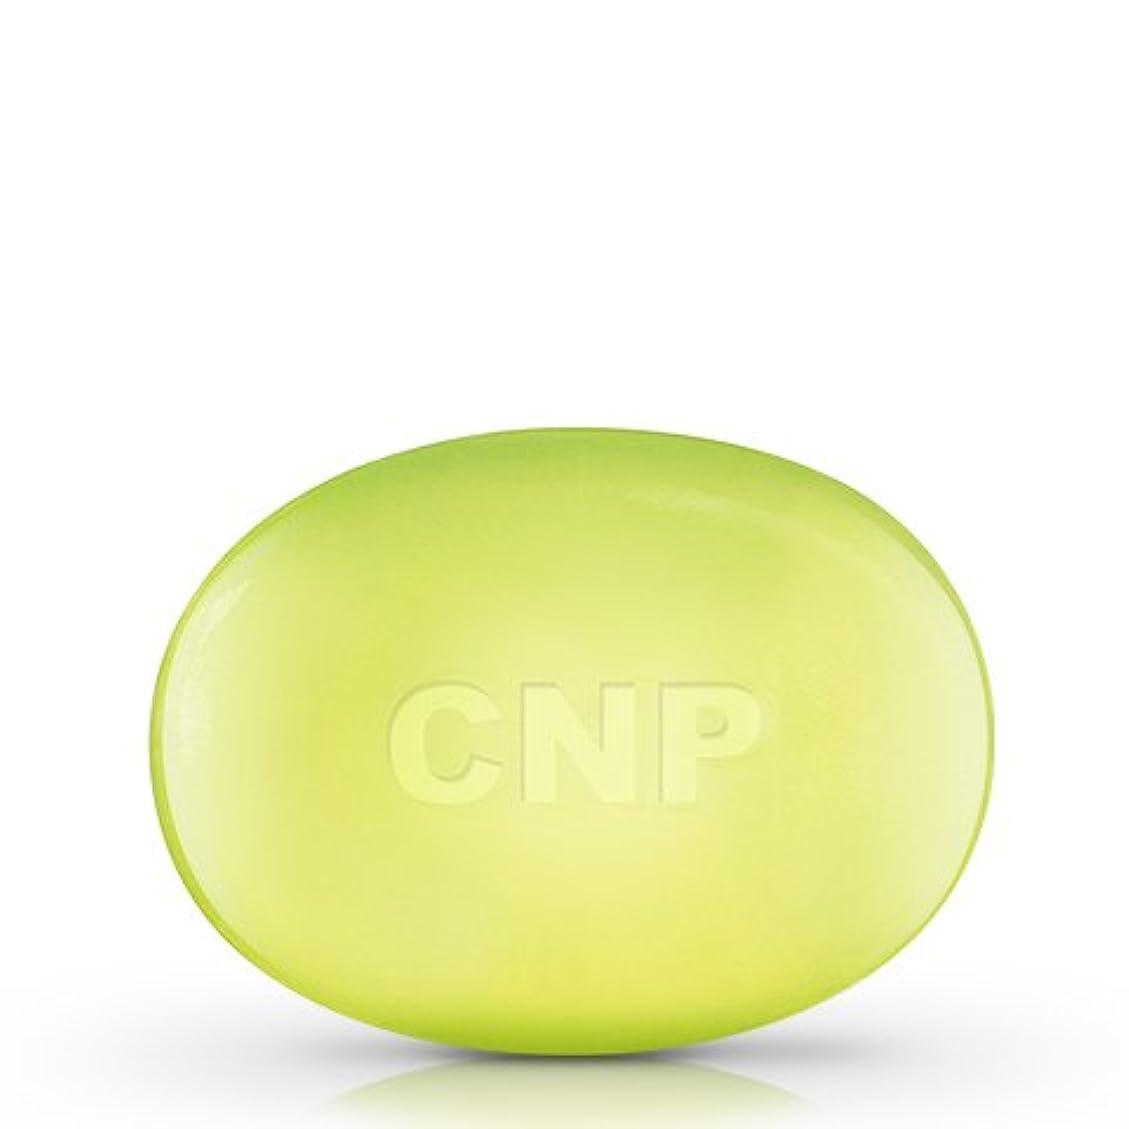 講堂主張粒CNP Laboratory 石鹸A/Soap A 100g [並行輸入品]